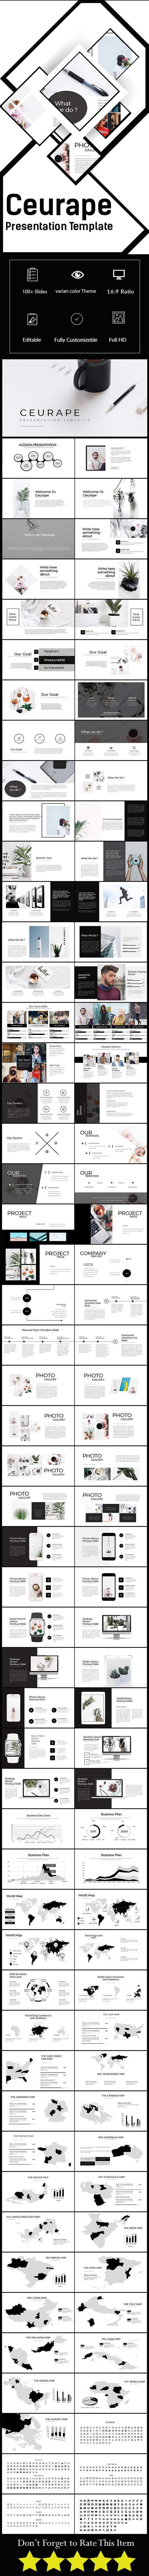 Ceurape Powerpoint Template - PowerPoint Templates Presentation Templates